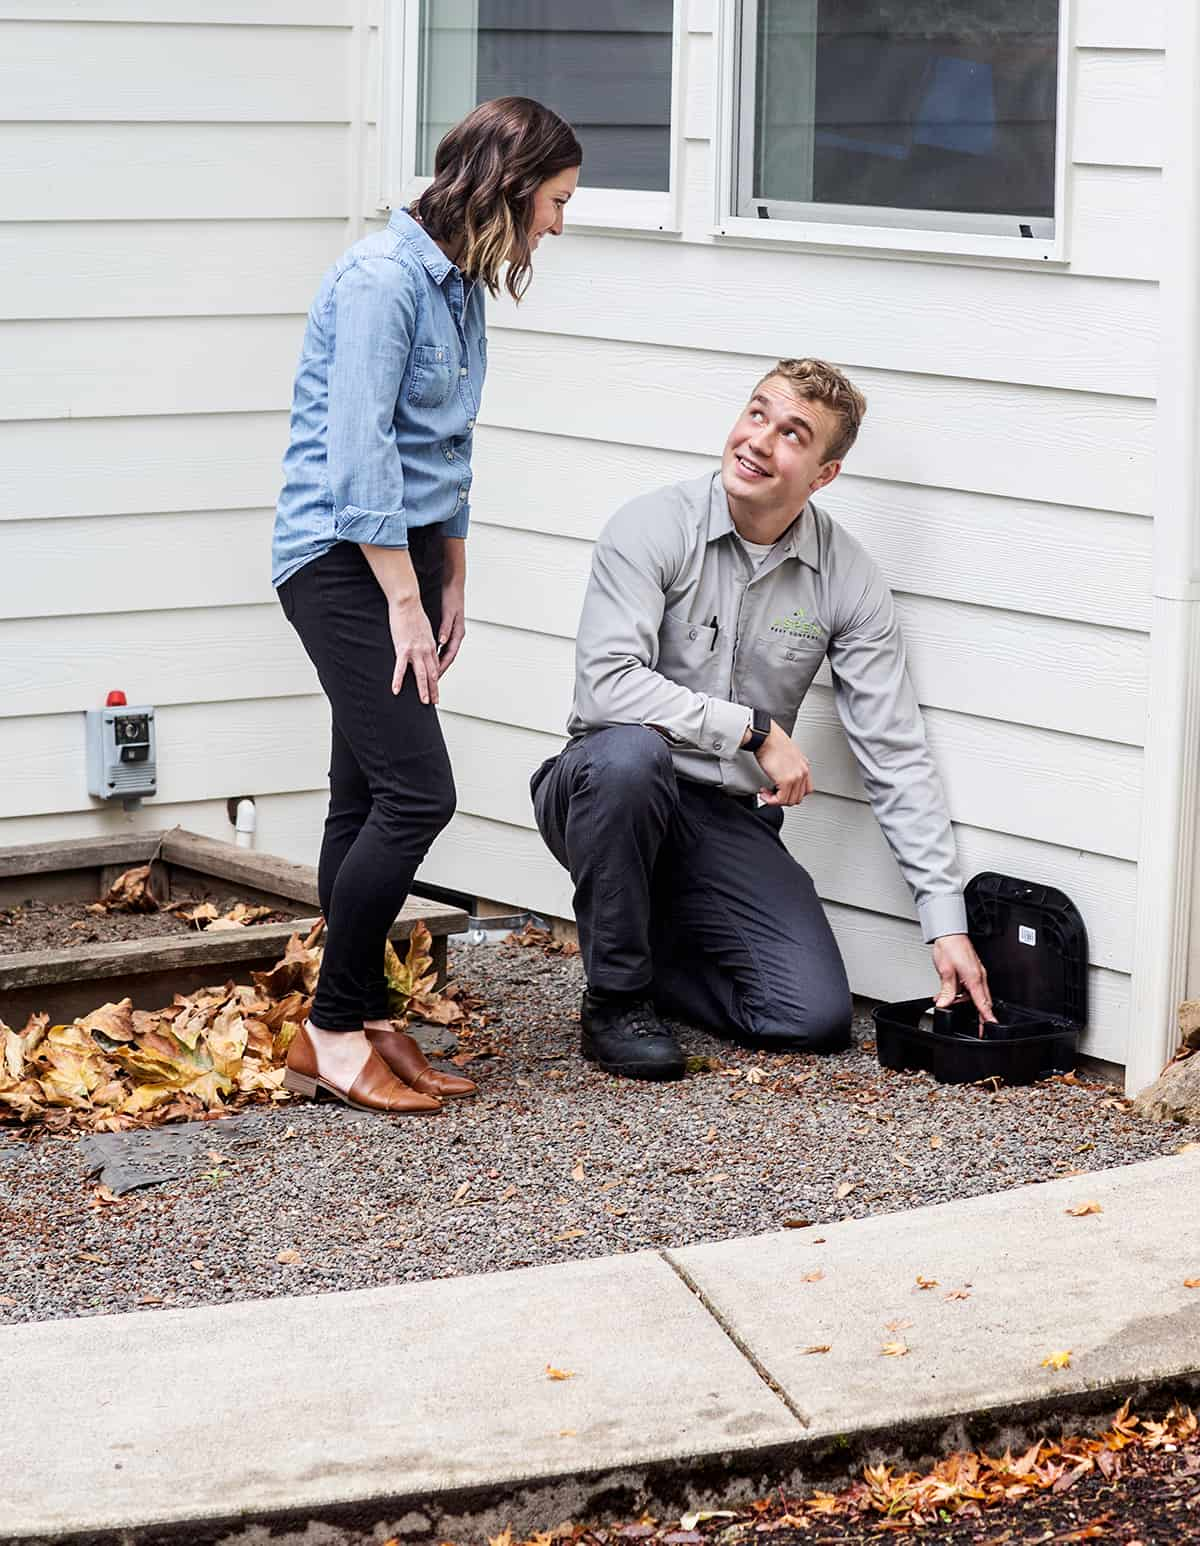 Aspen Pest Control Technician Setting Pest Bait Trap While Talking to Vancouver WA Homeowner